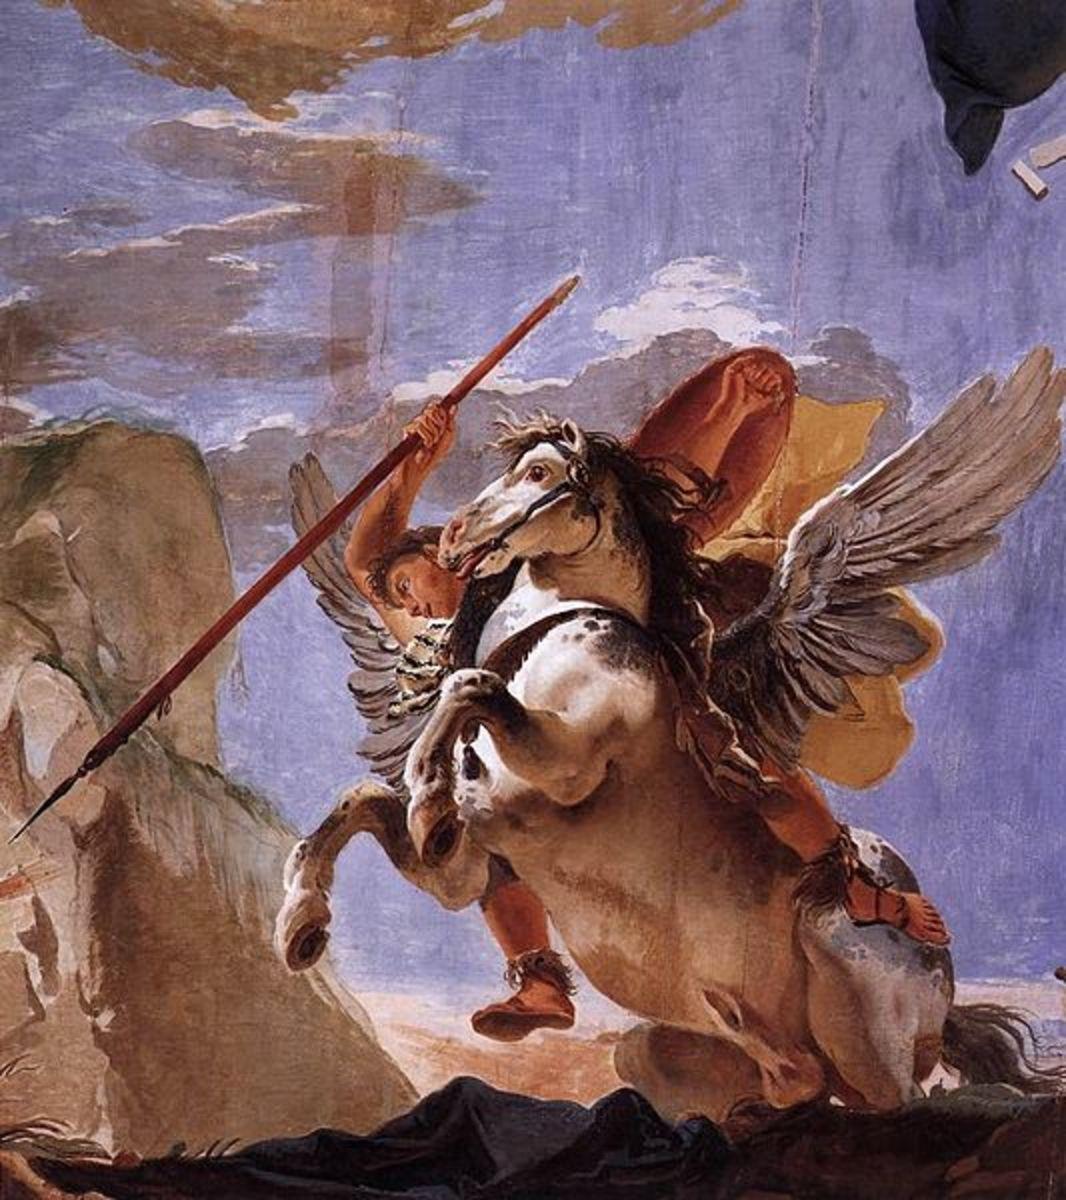 Bellerophon takes up his lance - Giovanni Battista Tiepolo (1696–1770) - PD-art-100